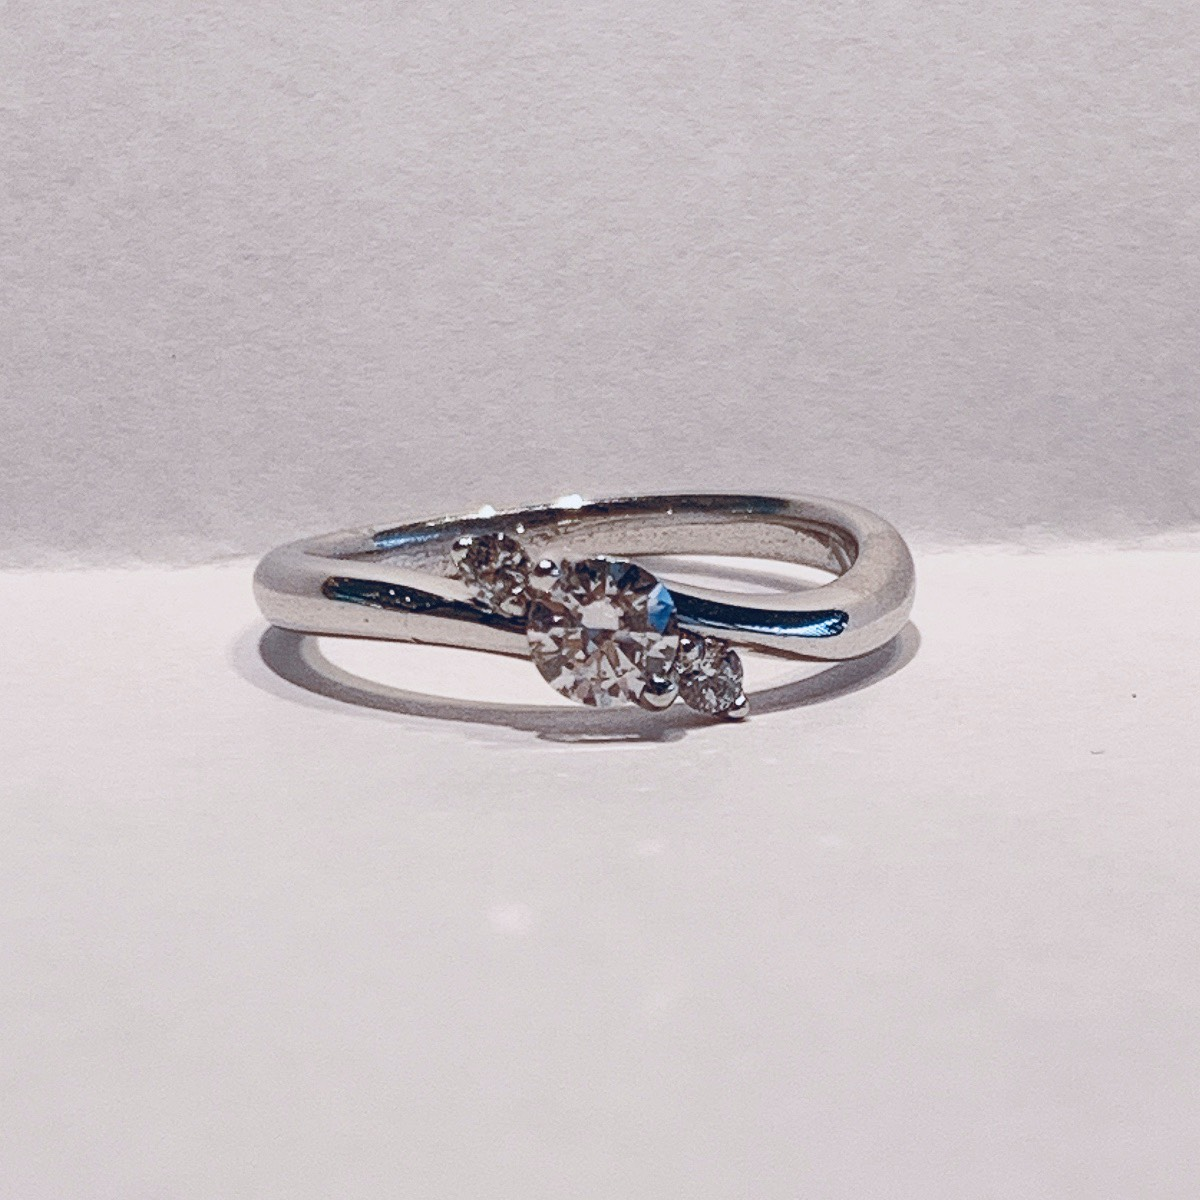 BROOCH 婚約指輪 エンゲージリング キャンディー型デザイン